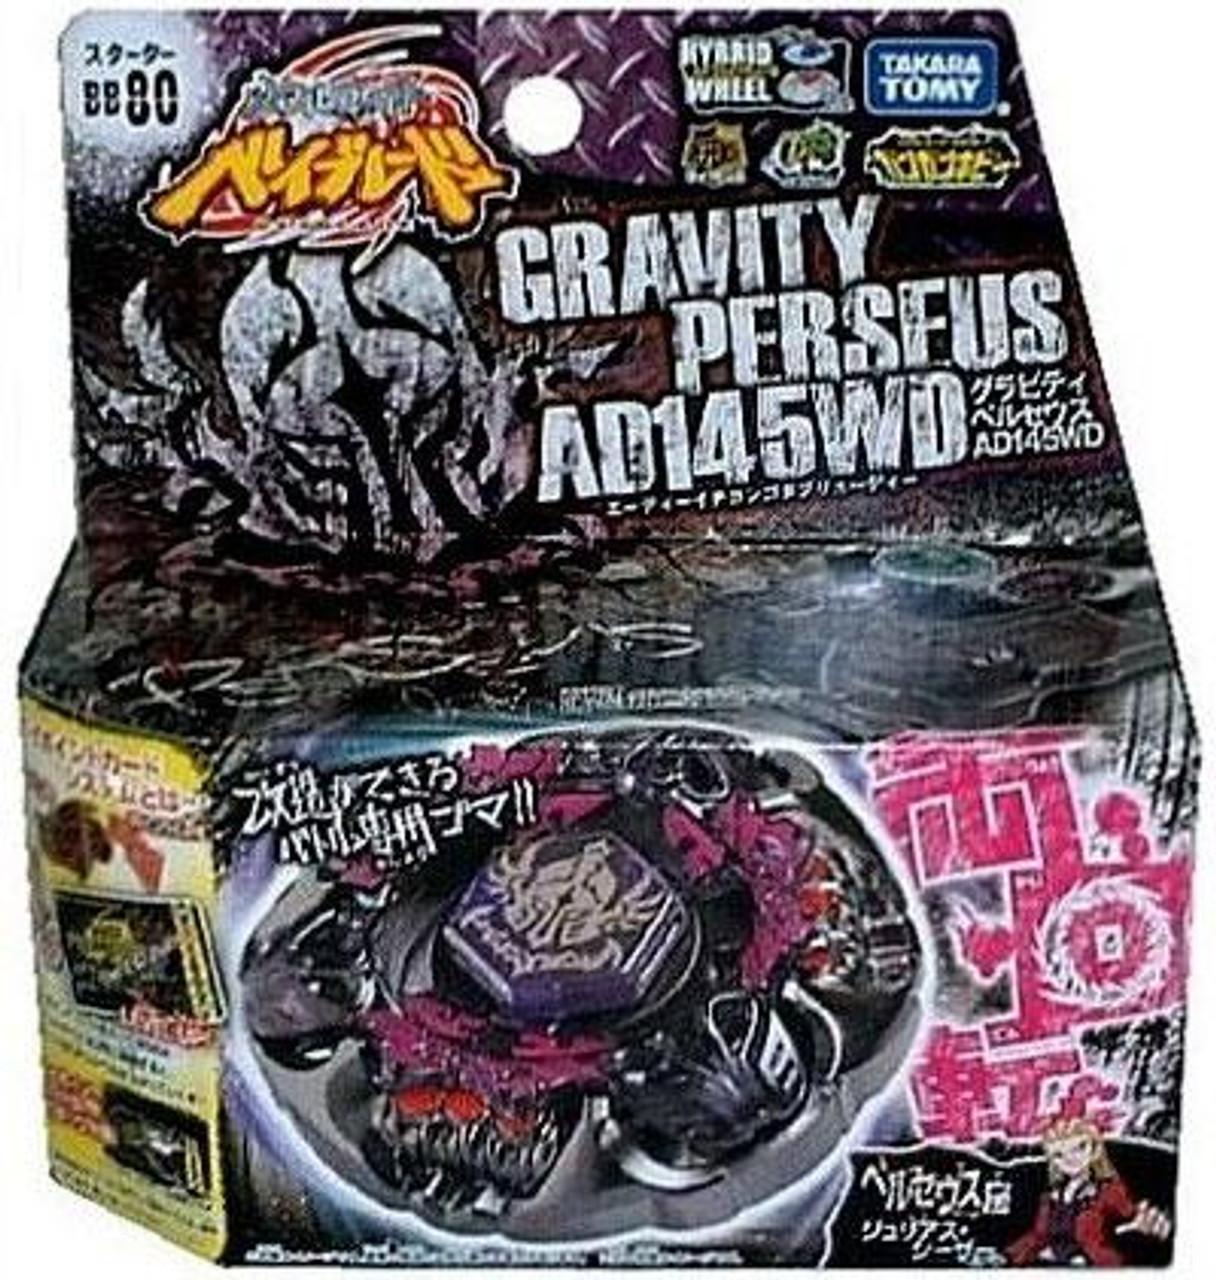 Beyblade Metal Fusion Japanese Gravity Perseus Starter Set BB-80 [AD145WD]